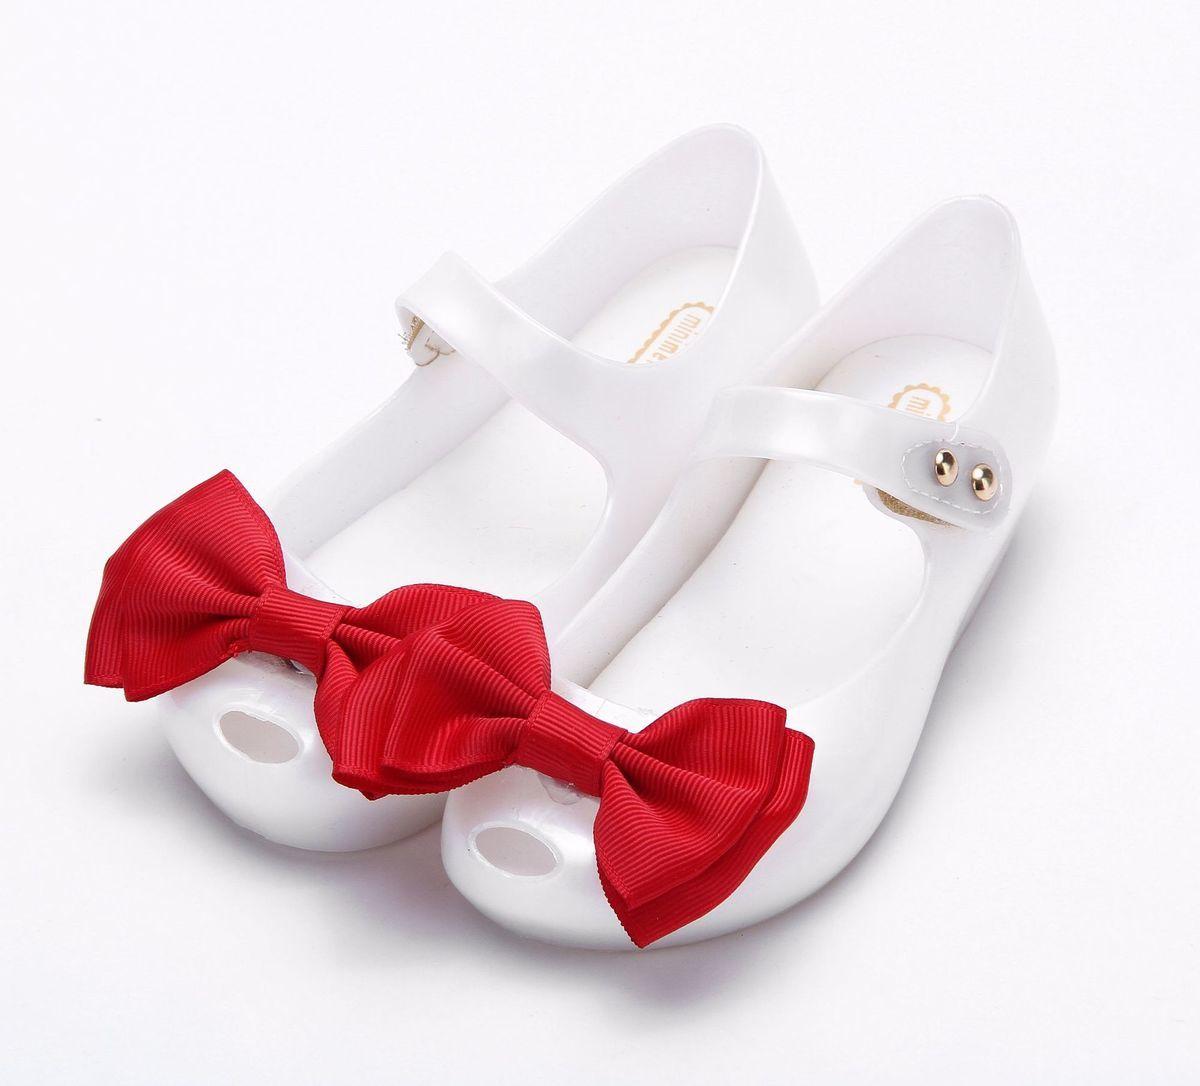 2018 Mini Melissa Cloth Bow Rain Shoes New Summer 2 Layer Shoe Girls Low-Top Sandal Nonslip Kids Soft Leather PVC Sandal